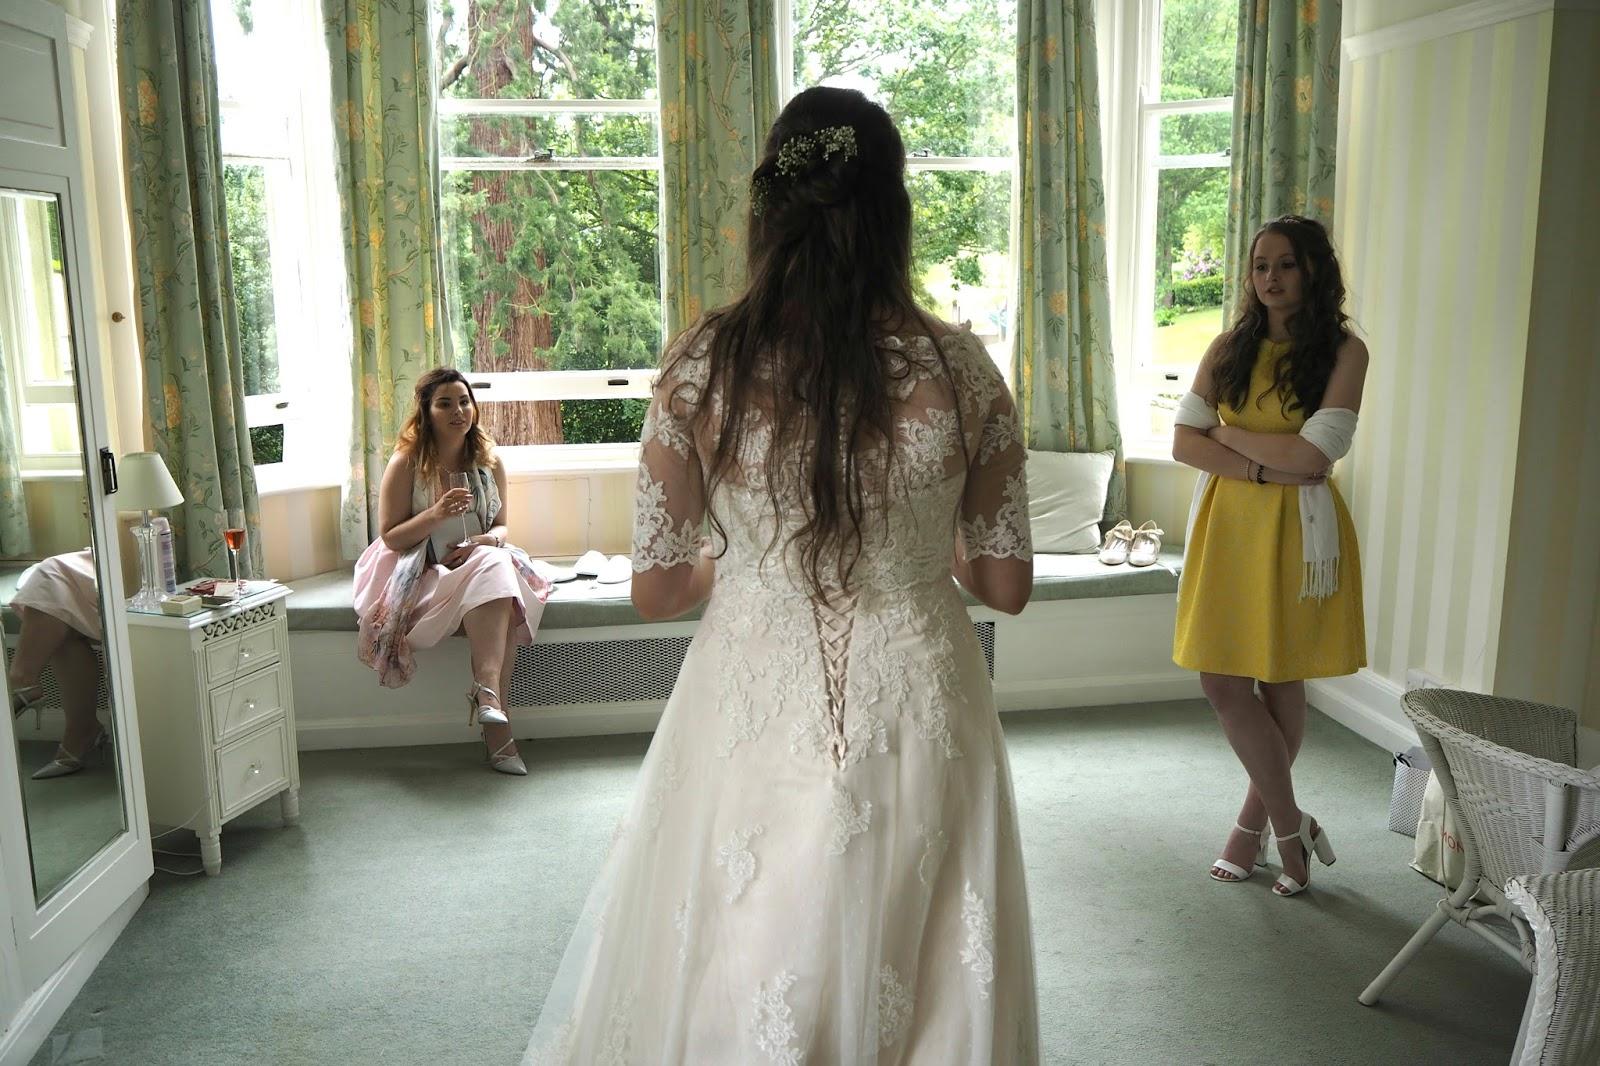 Bride talking to friends